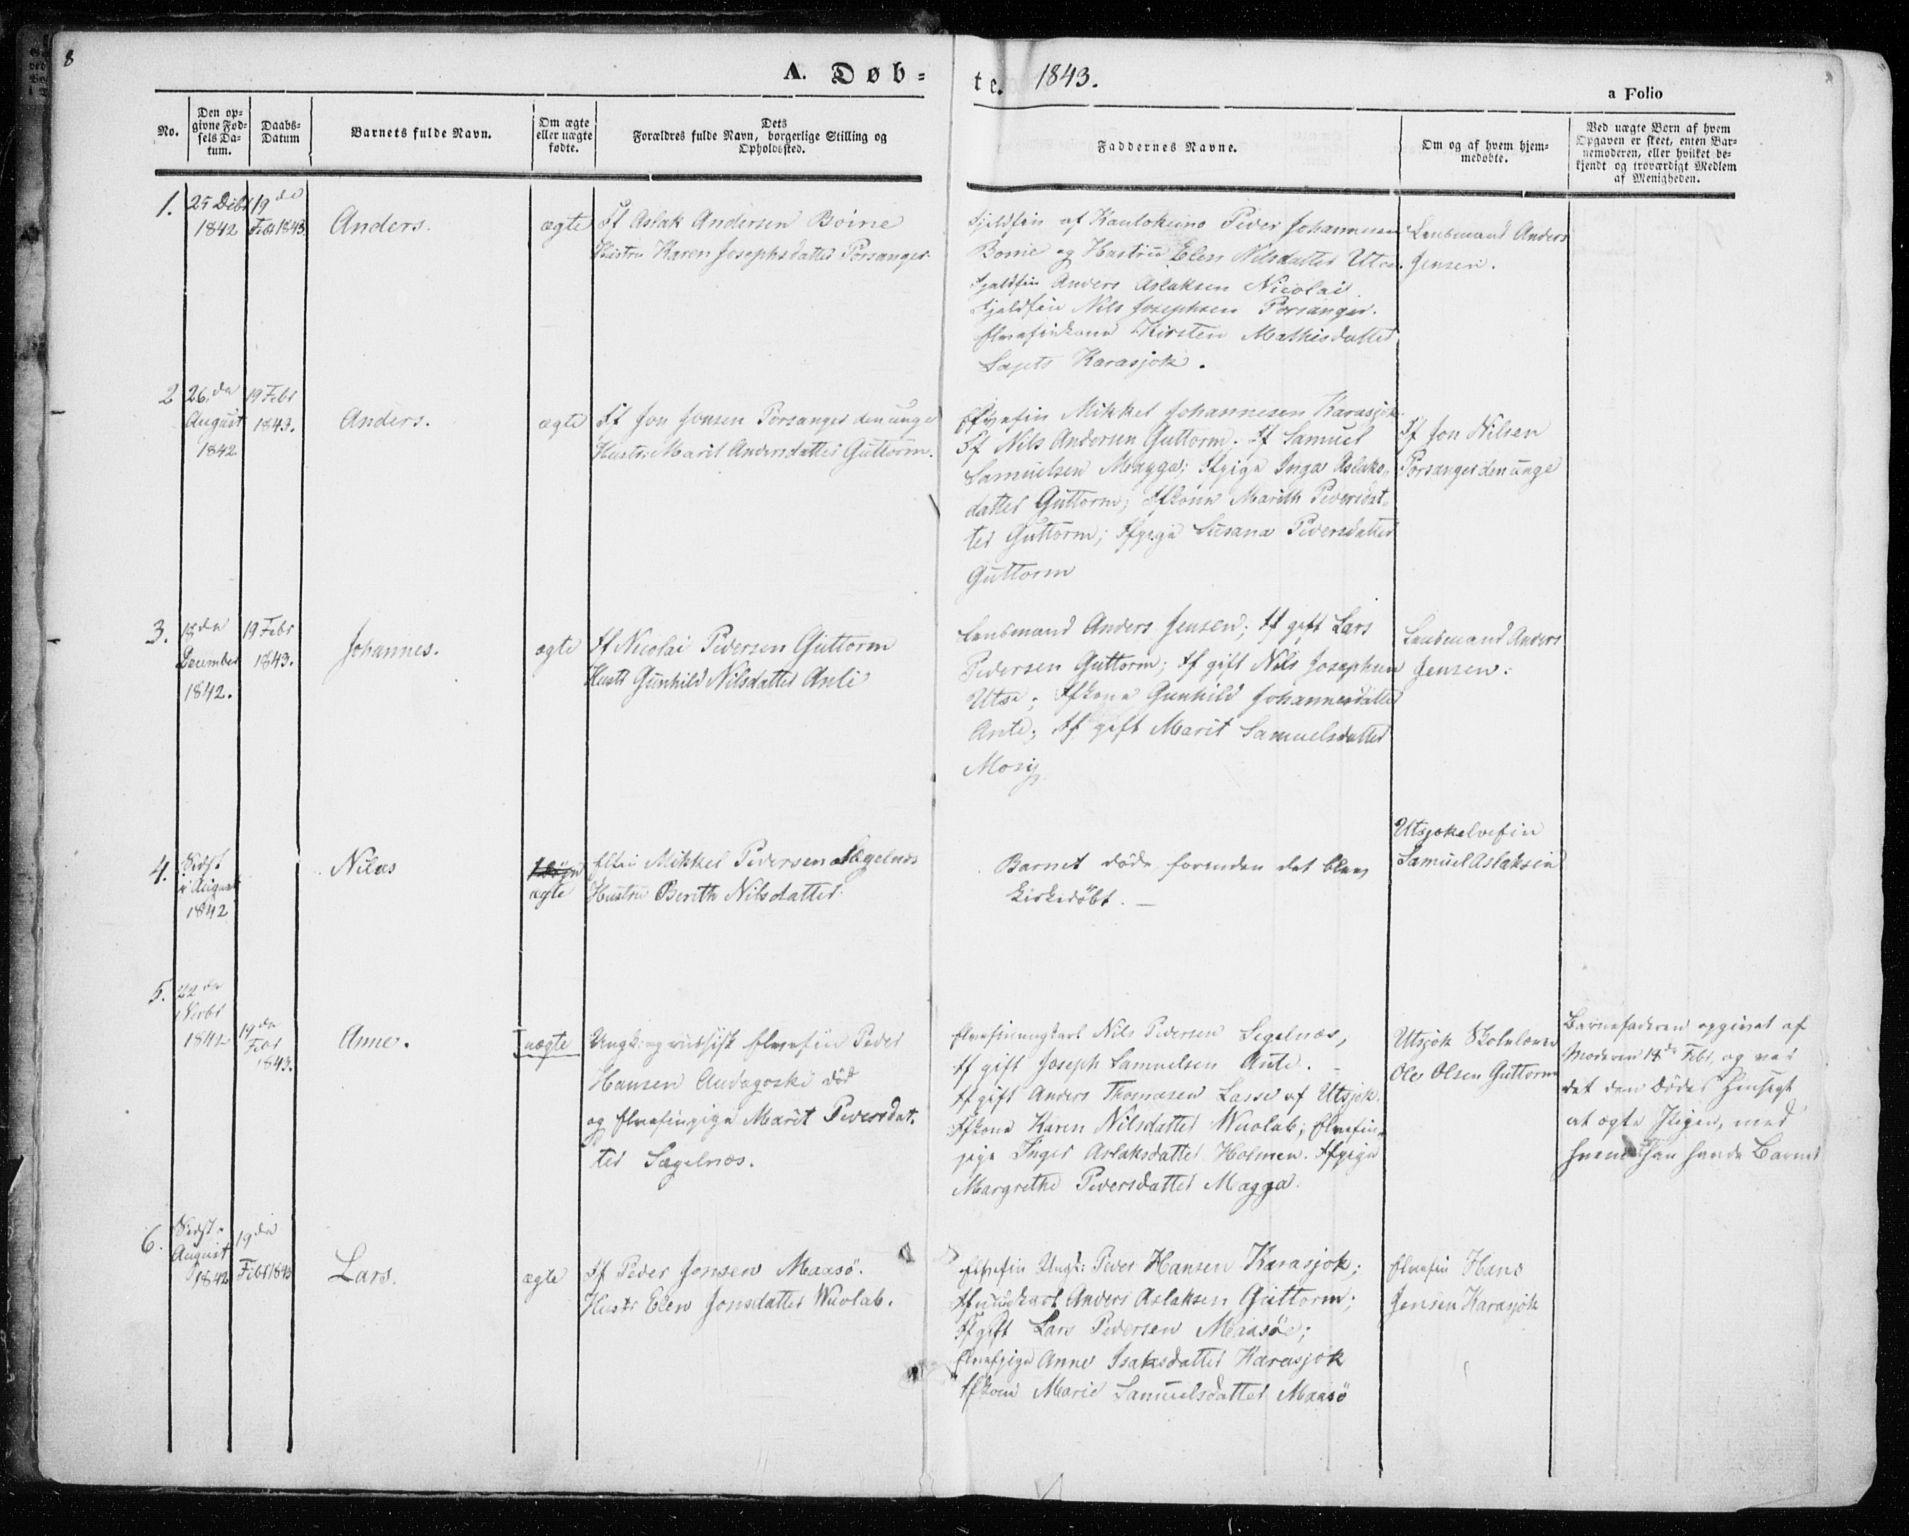 SATØ, Kistrand/Porsanger sokneprestembete, H/Ha/L0012.kirke: Ministerialbok nr. 12, 1843-1871, s. 8-9